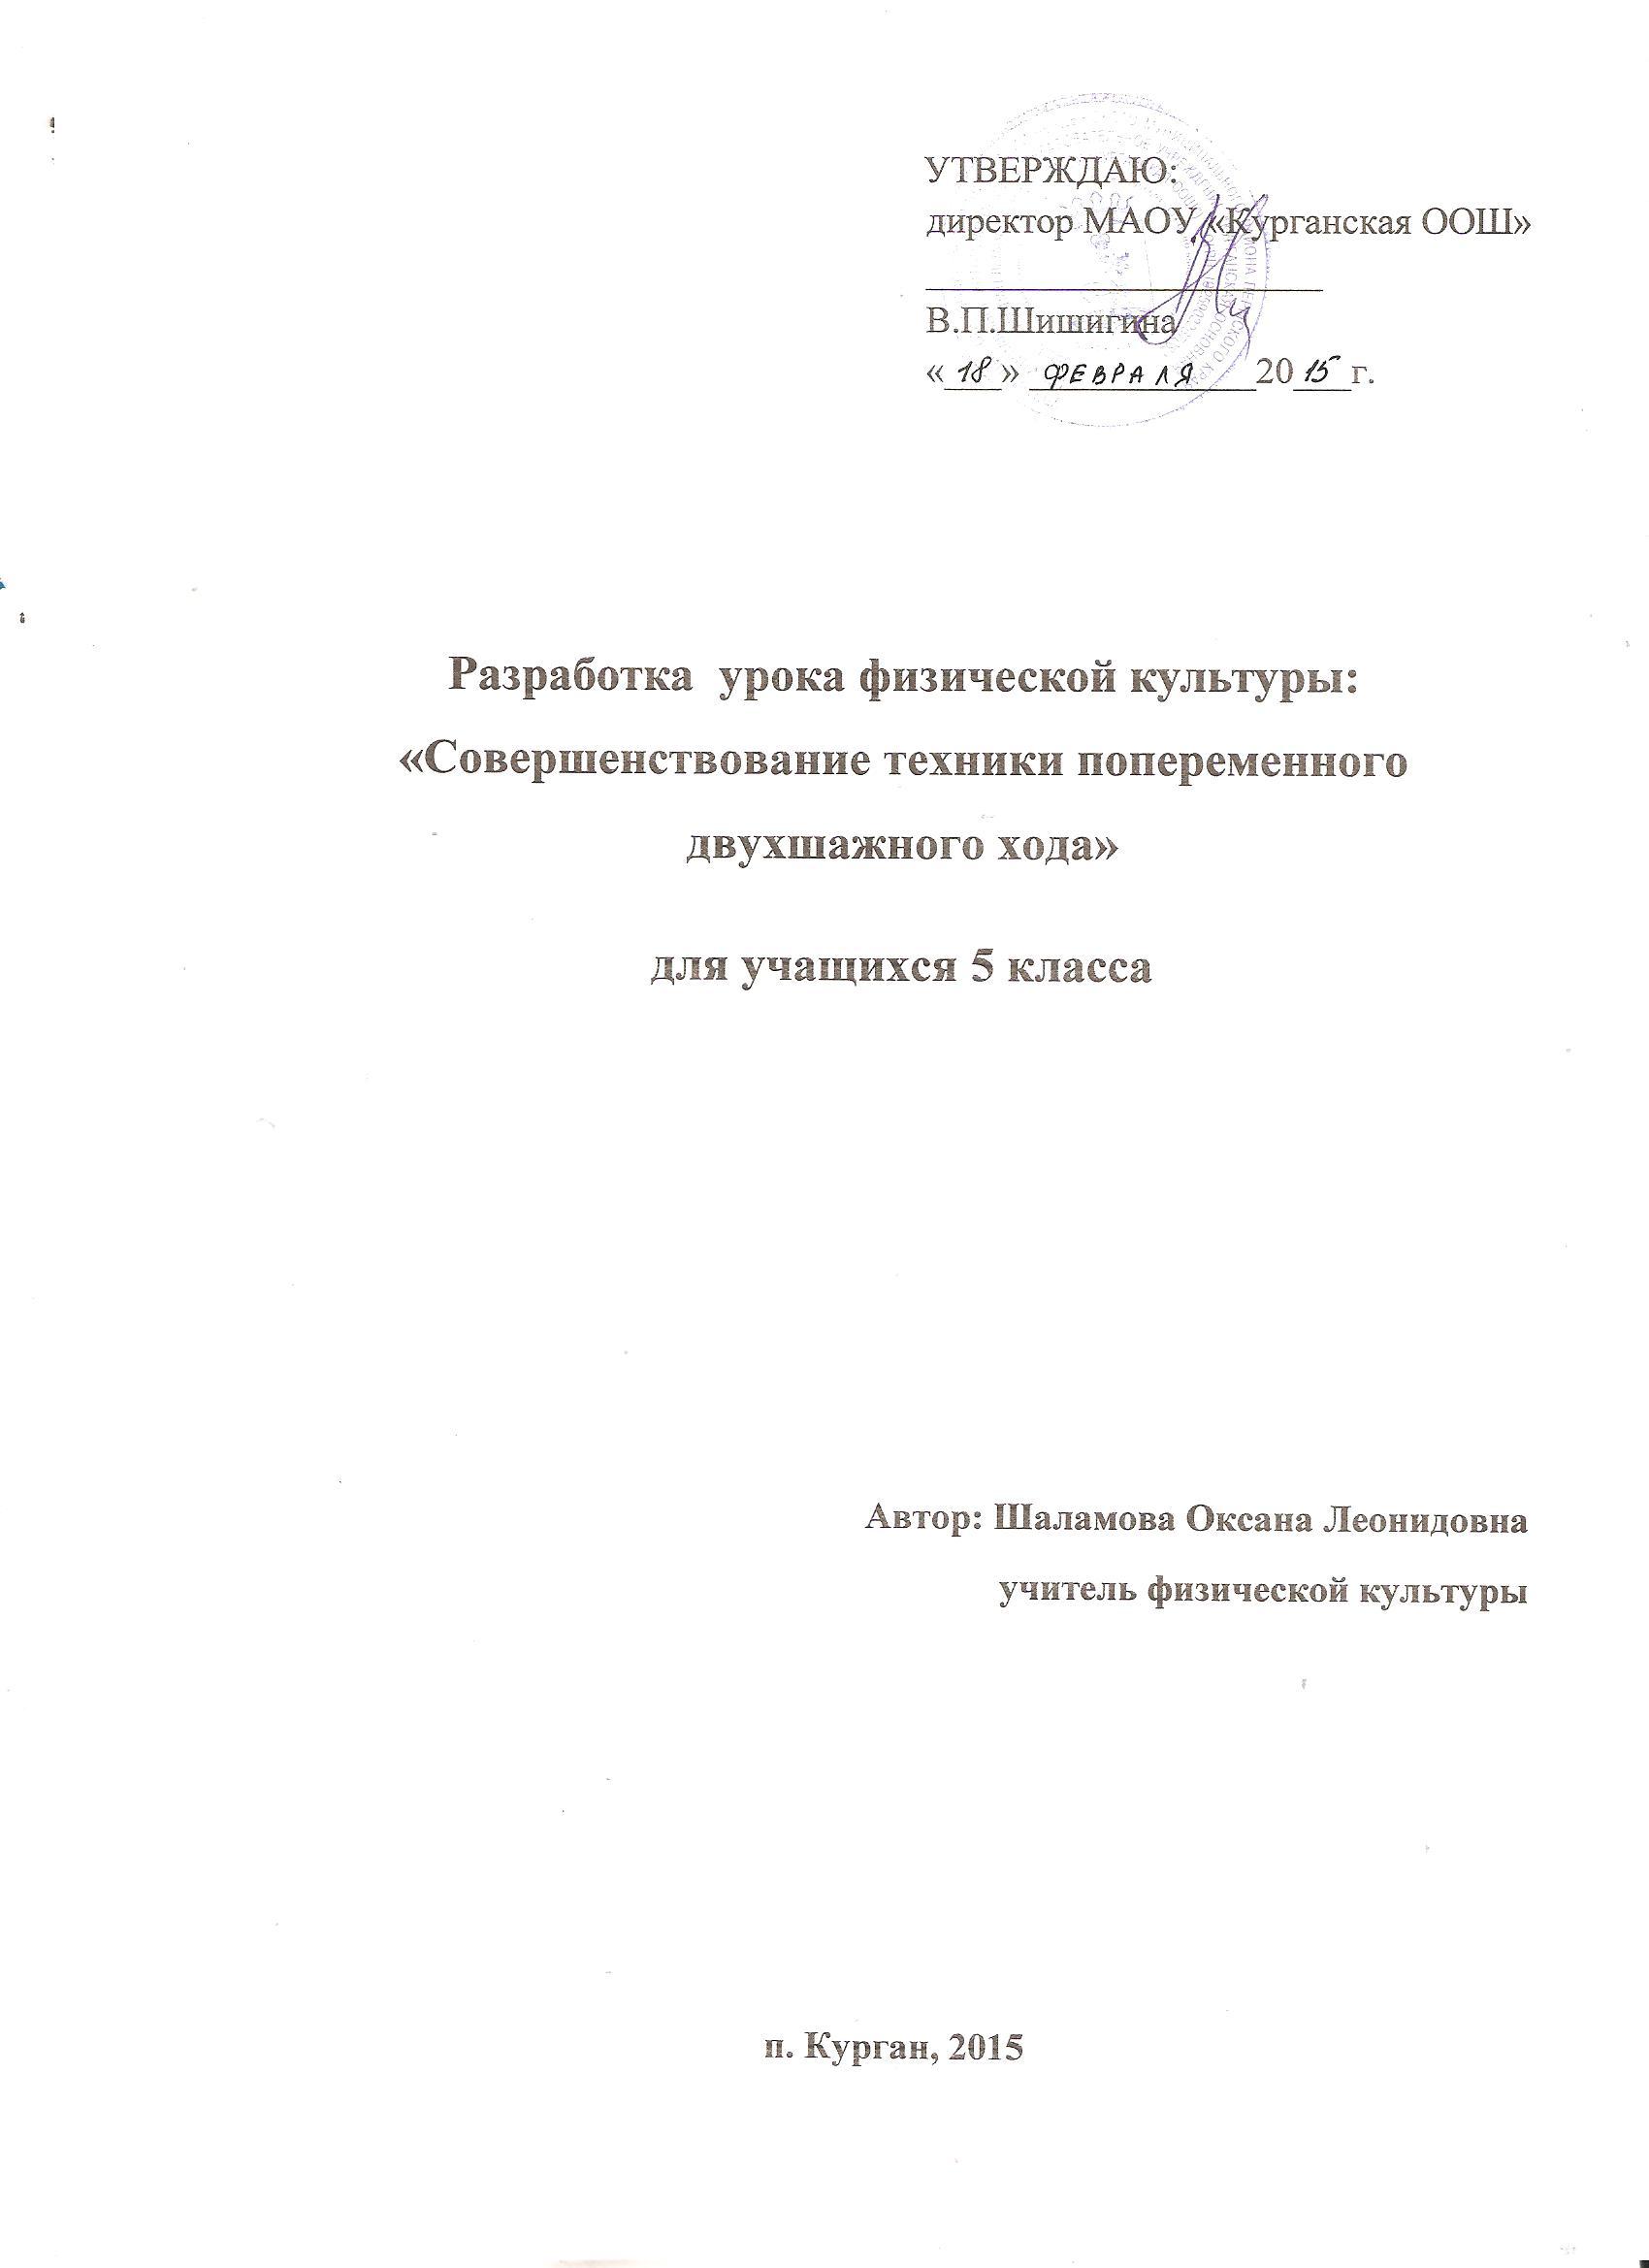 C:\Documents and Settings\учитель\Рабочий стол\1.jpg